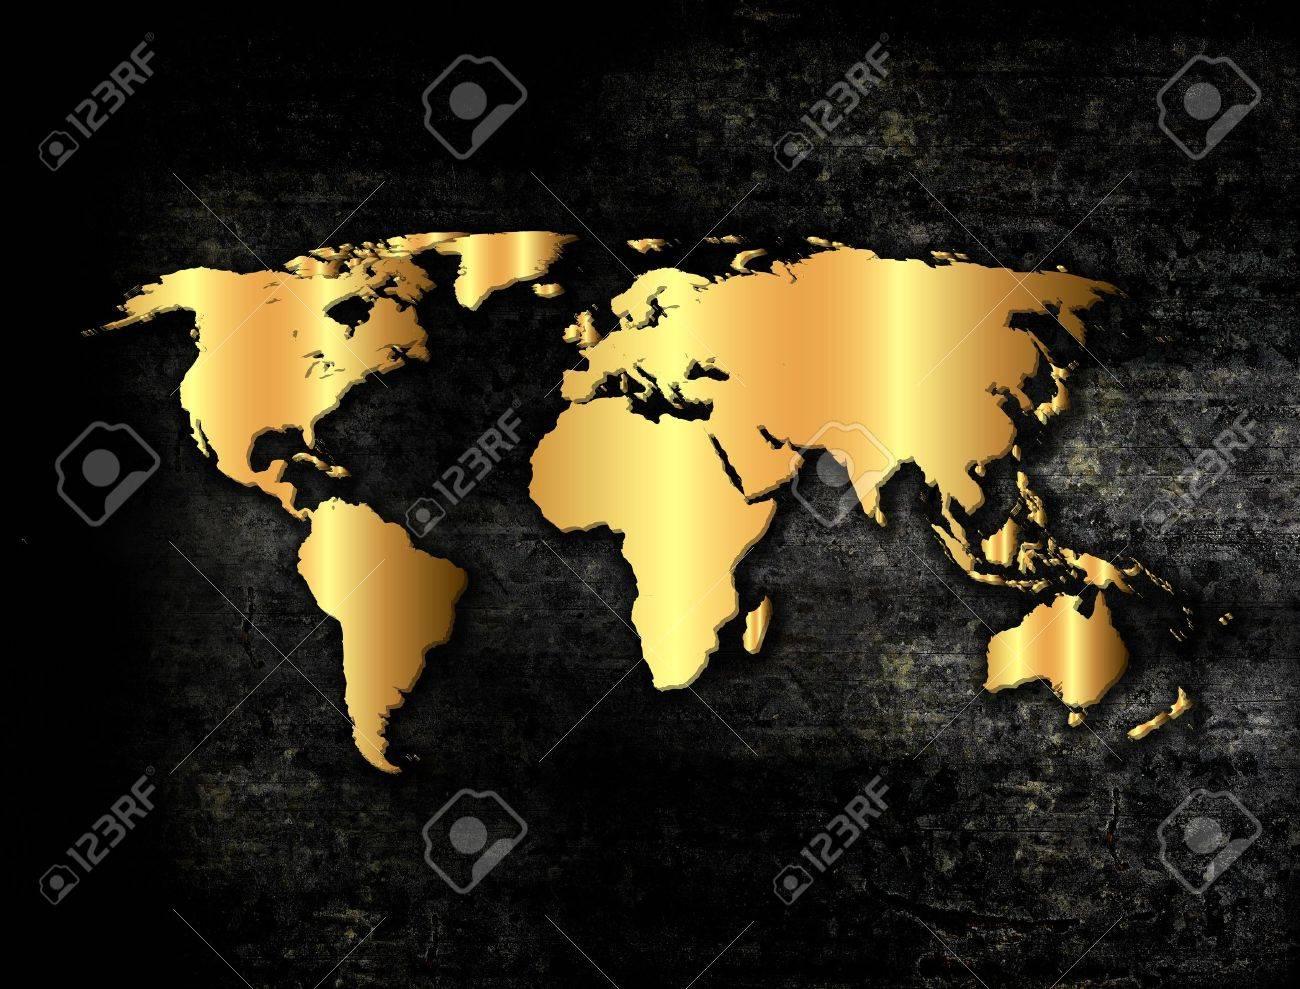 Golden world map in grunge style - 17323016